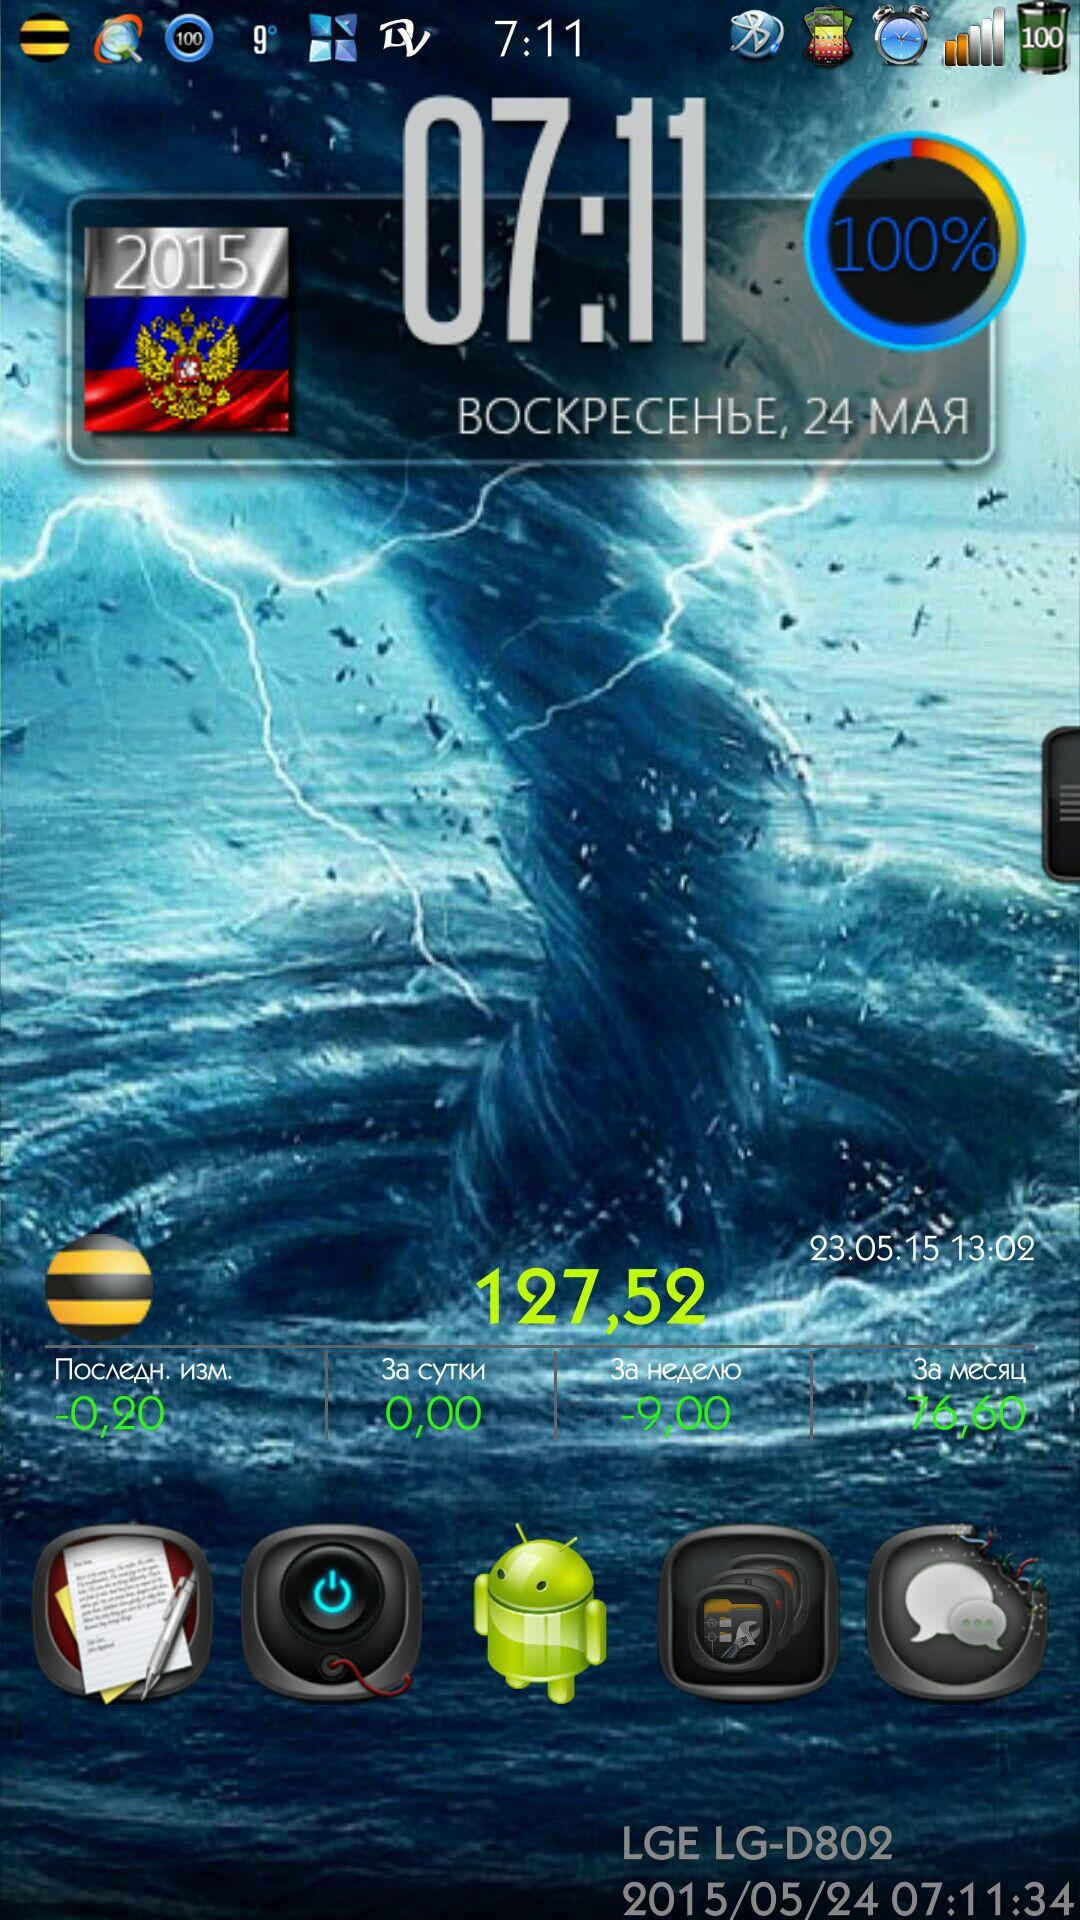 Tornado Live Wallpaper 10 Android Trashbox 1080x1920